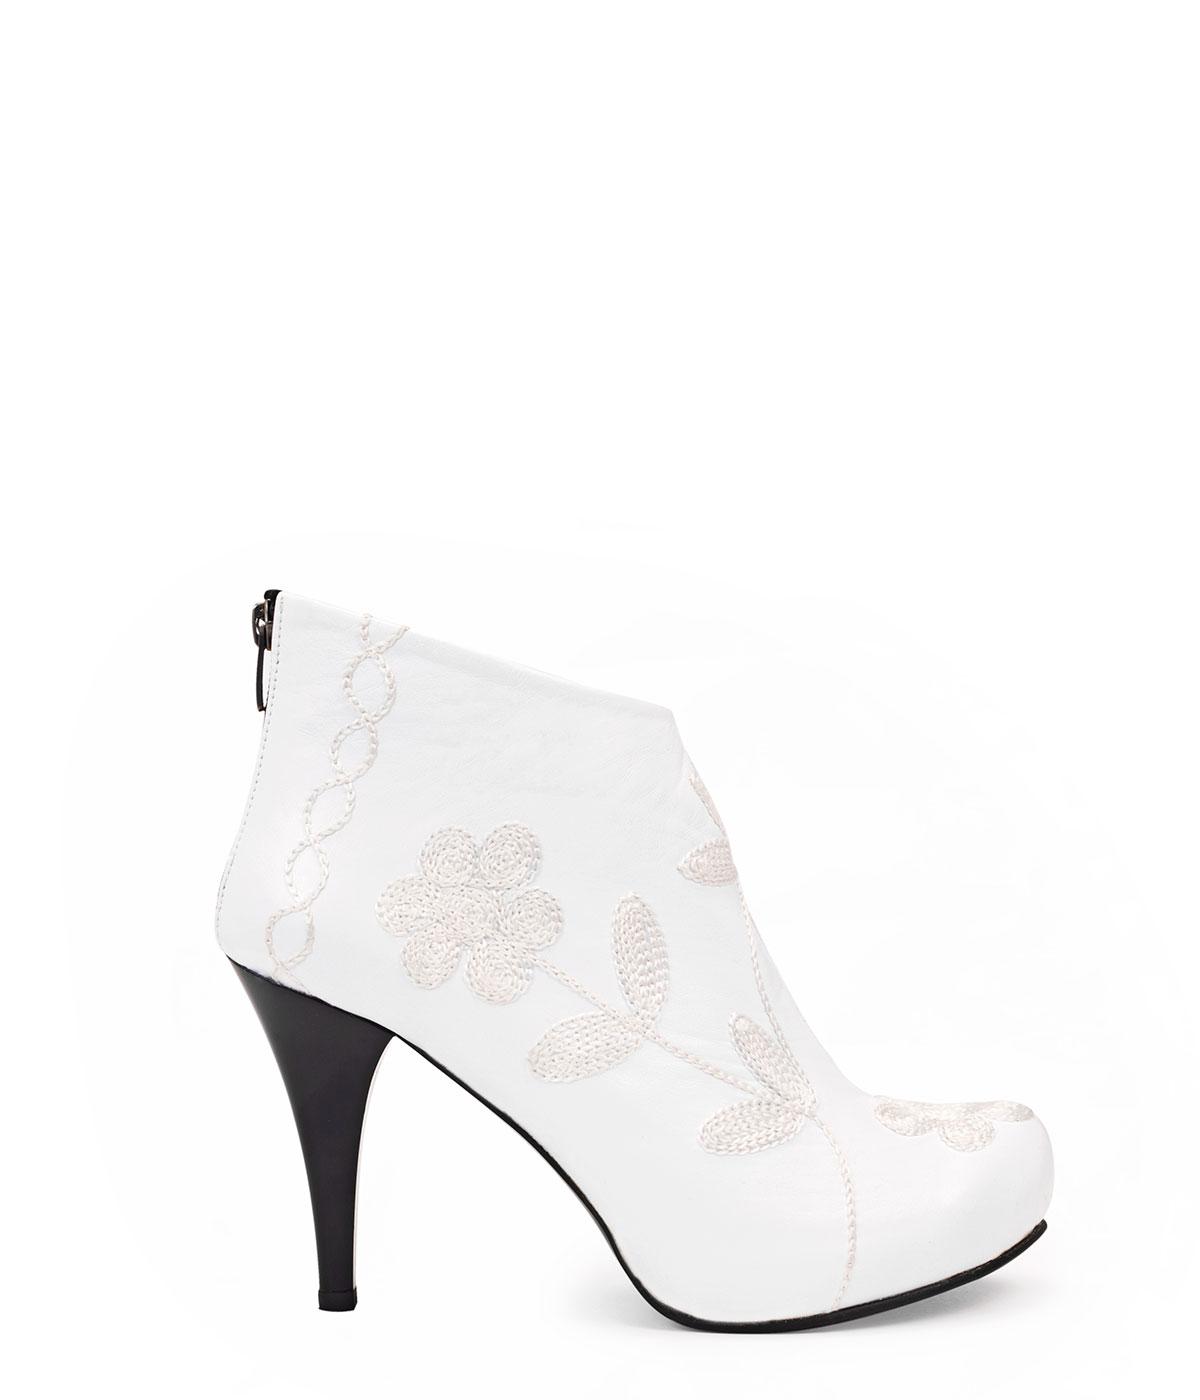 ms-calfskin-white-bootie-a